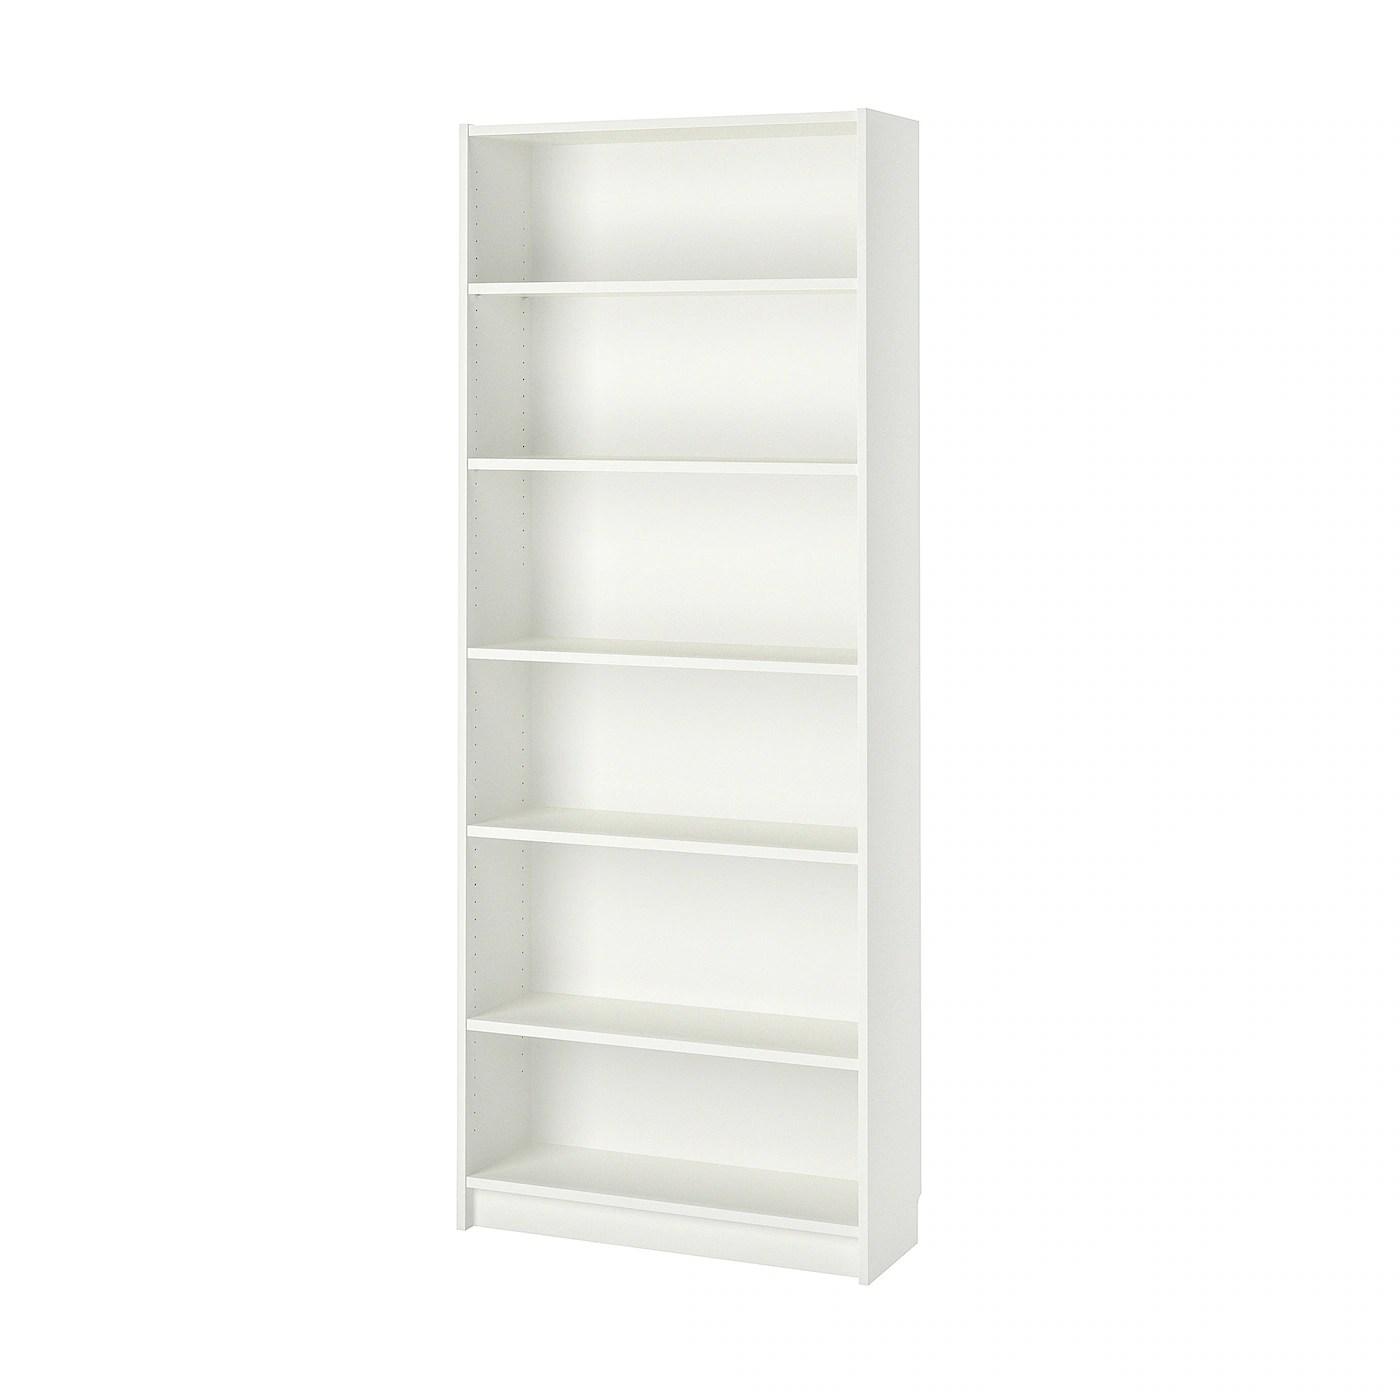 Bookcases   Bookcase Doors   Bookcase Shelves ...